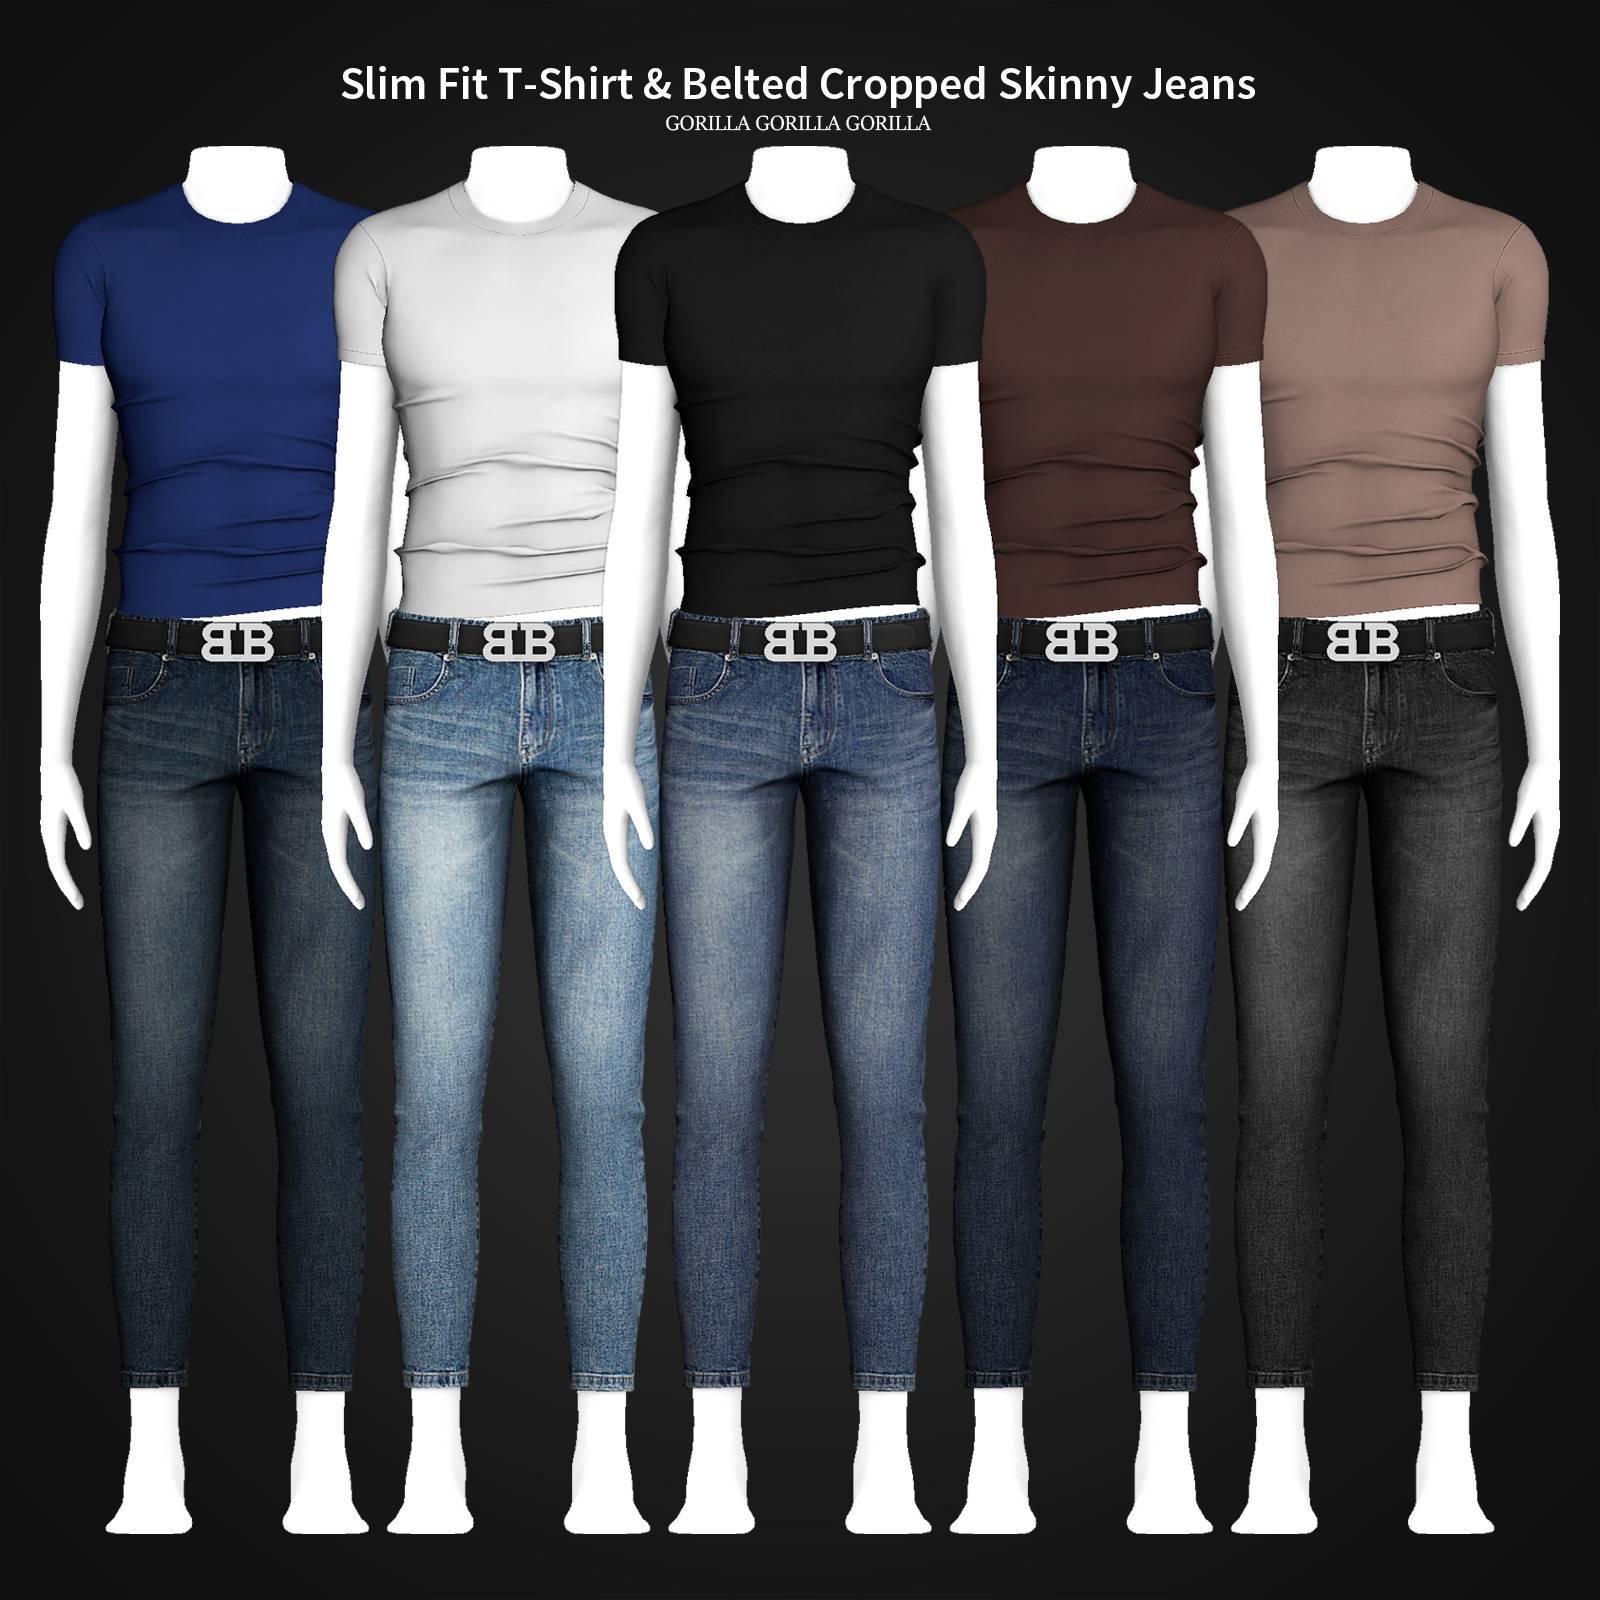 Футболка и джинсы - Slim Fit T-Shirt & Belted Cropped Skinny Jeans